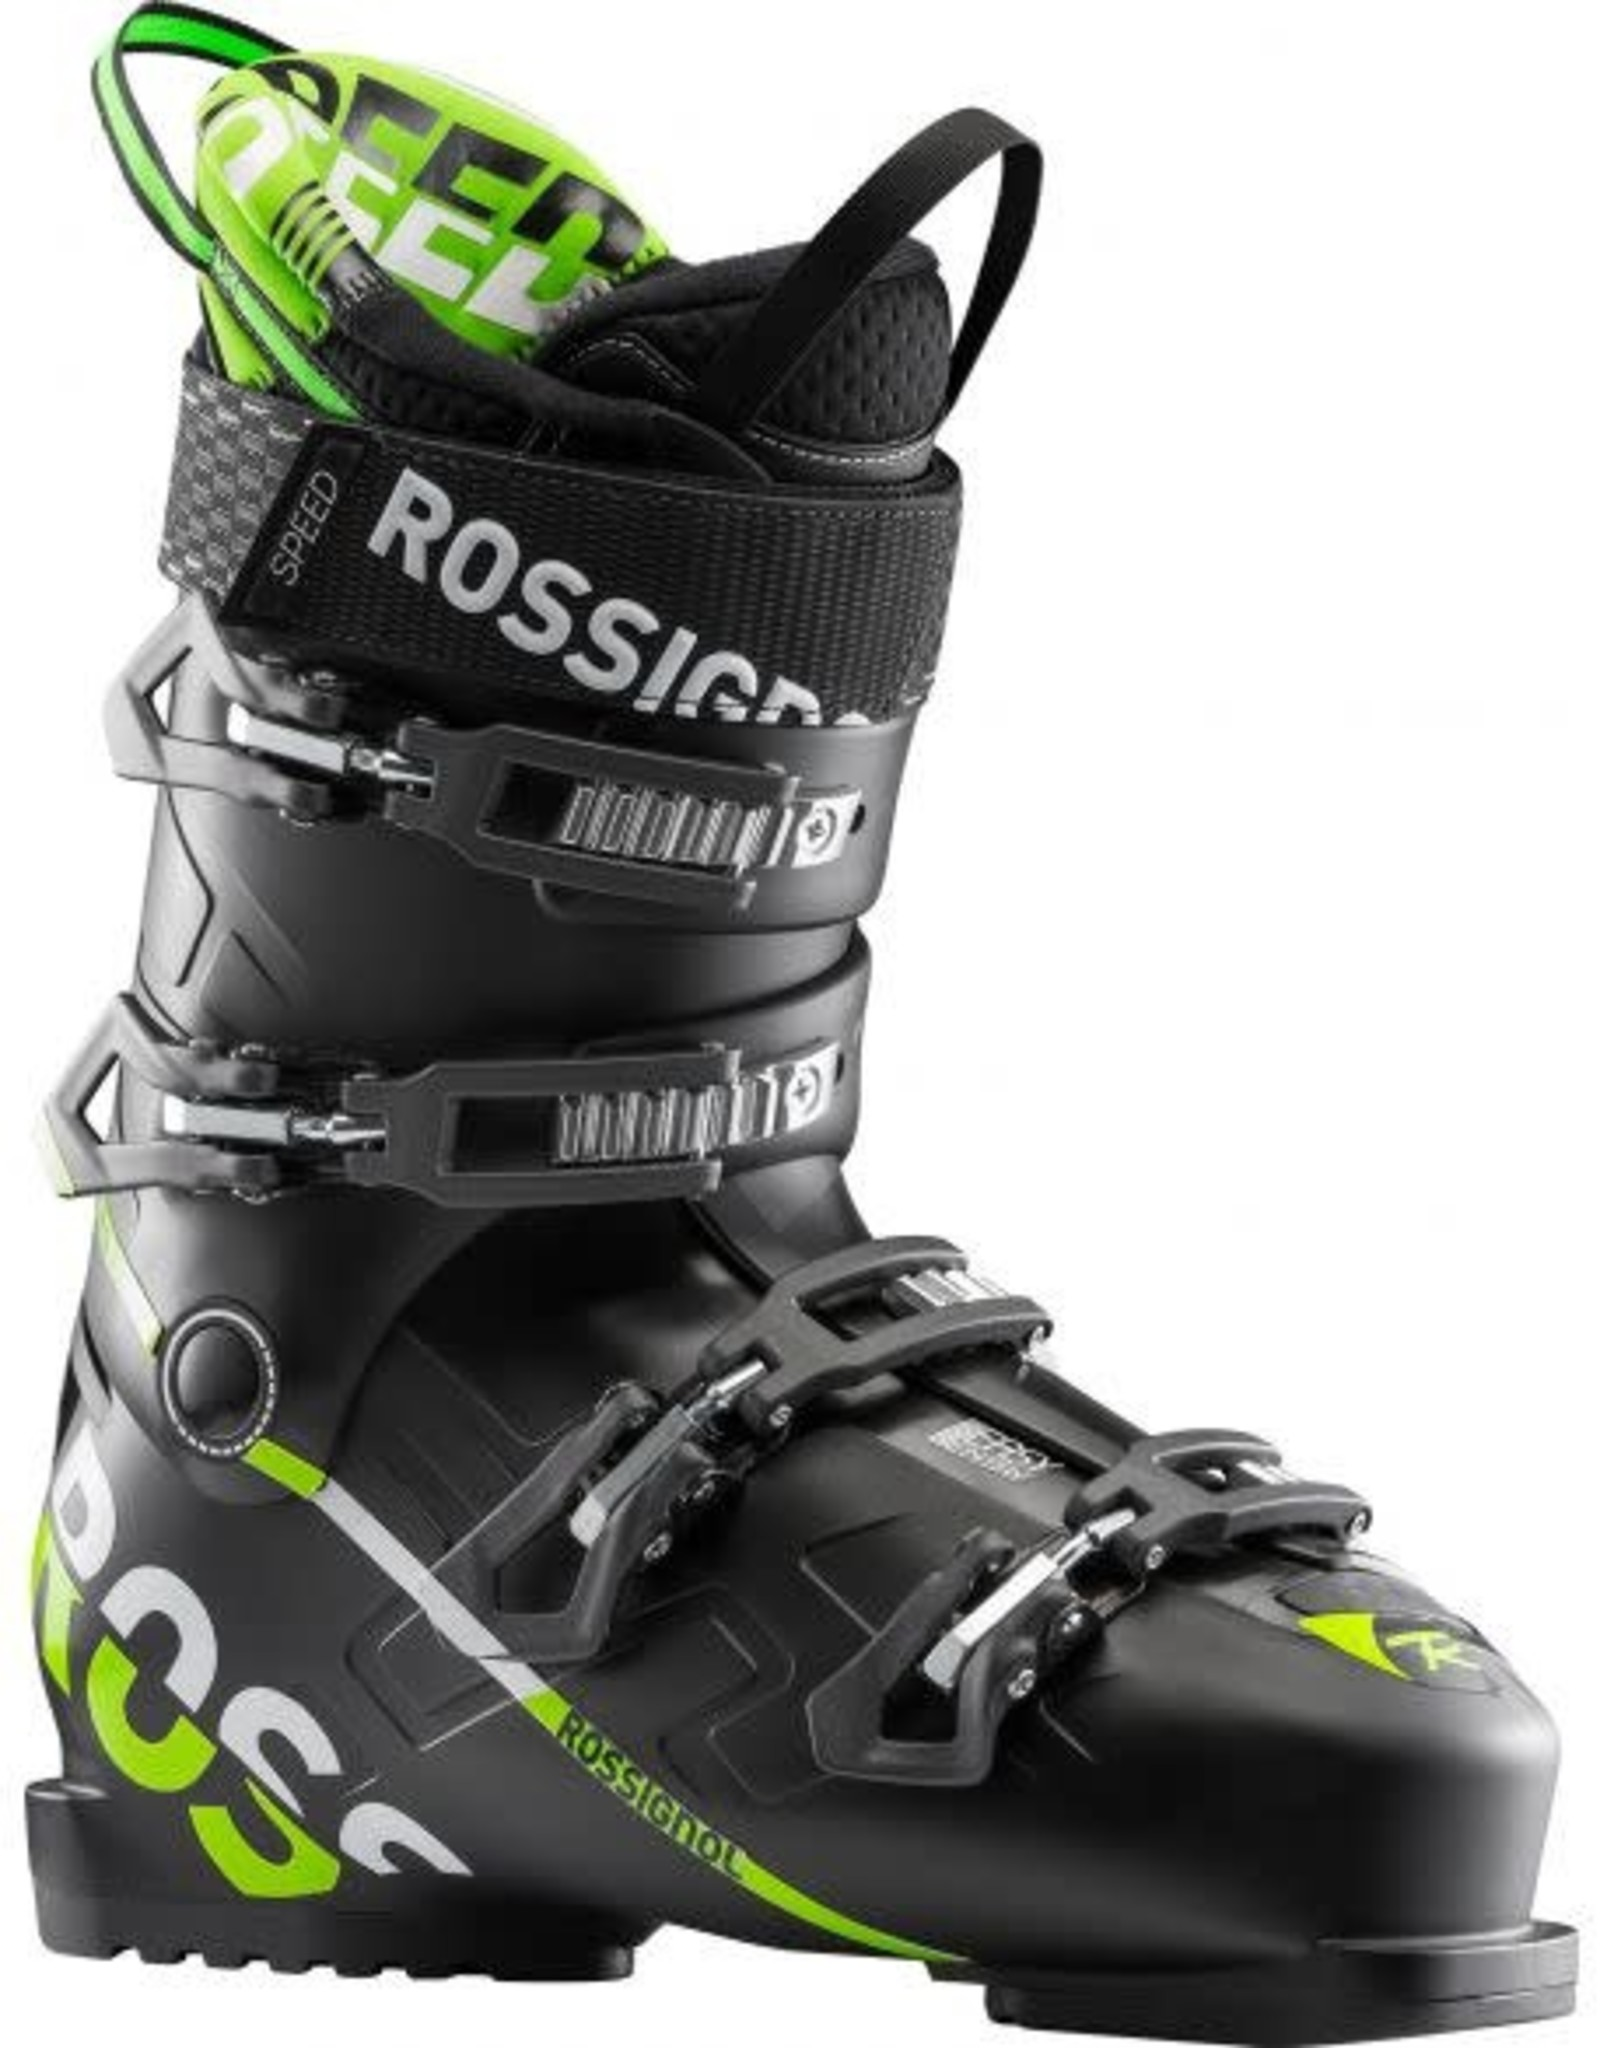 ROSSIGNOL Rossignol Speed 80 ski boot 28.5